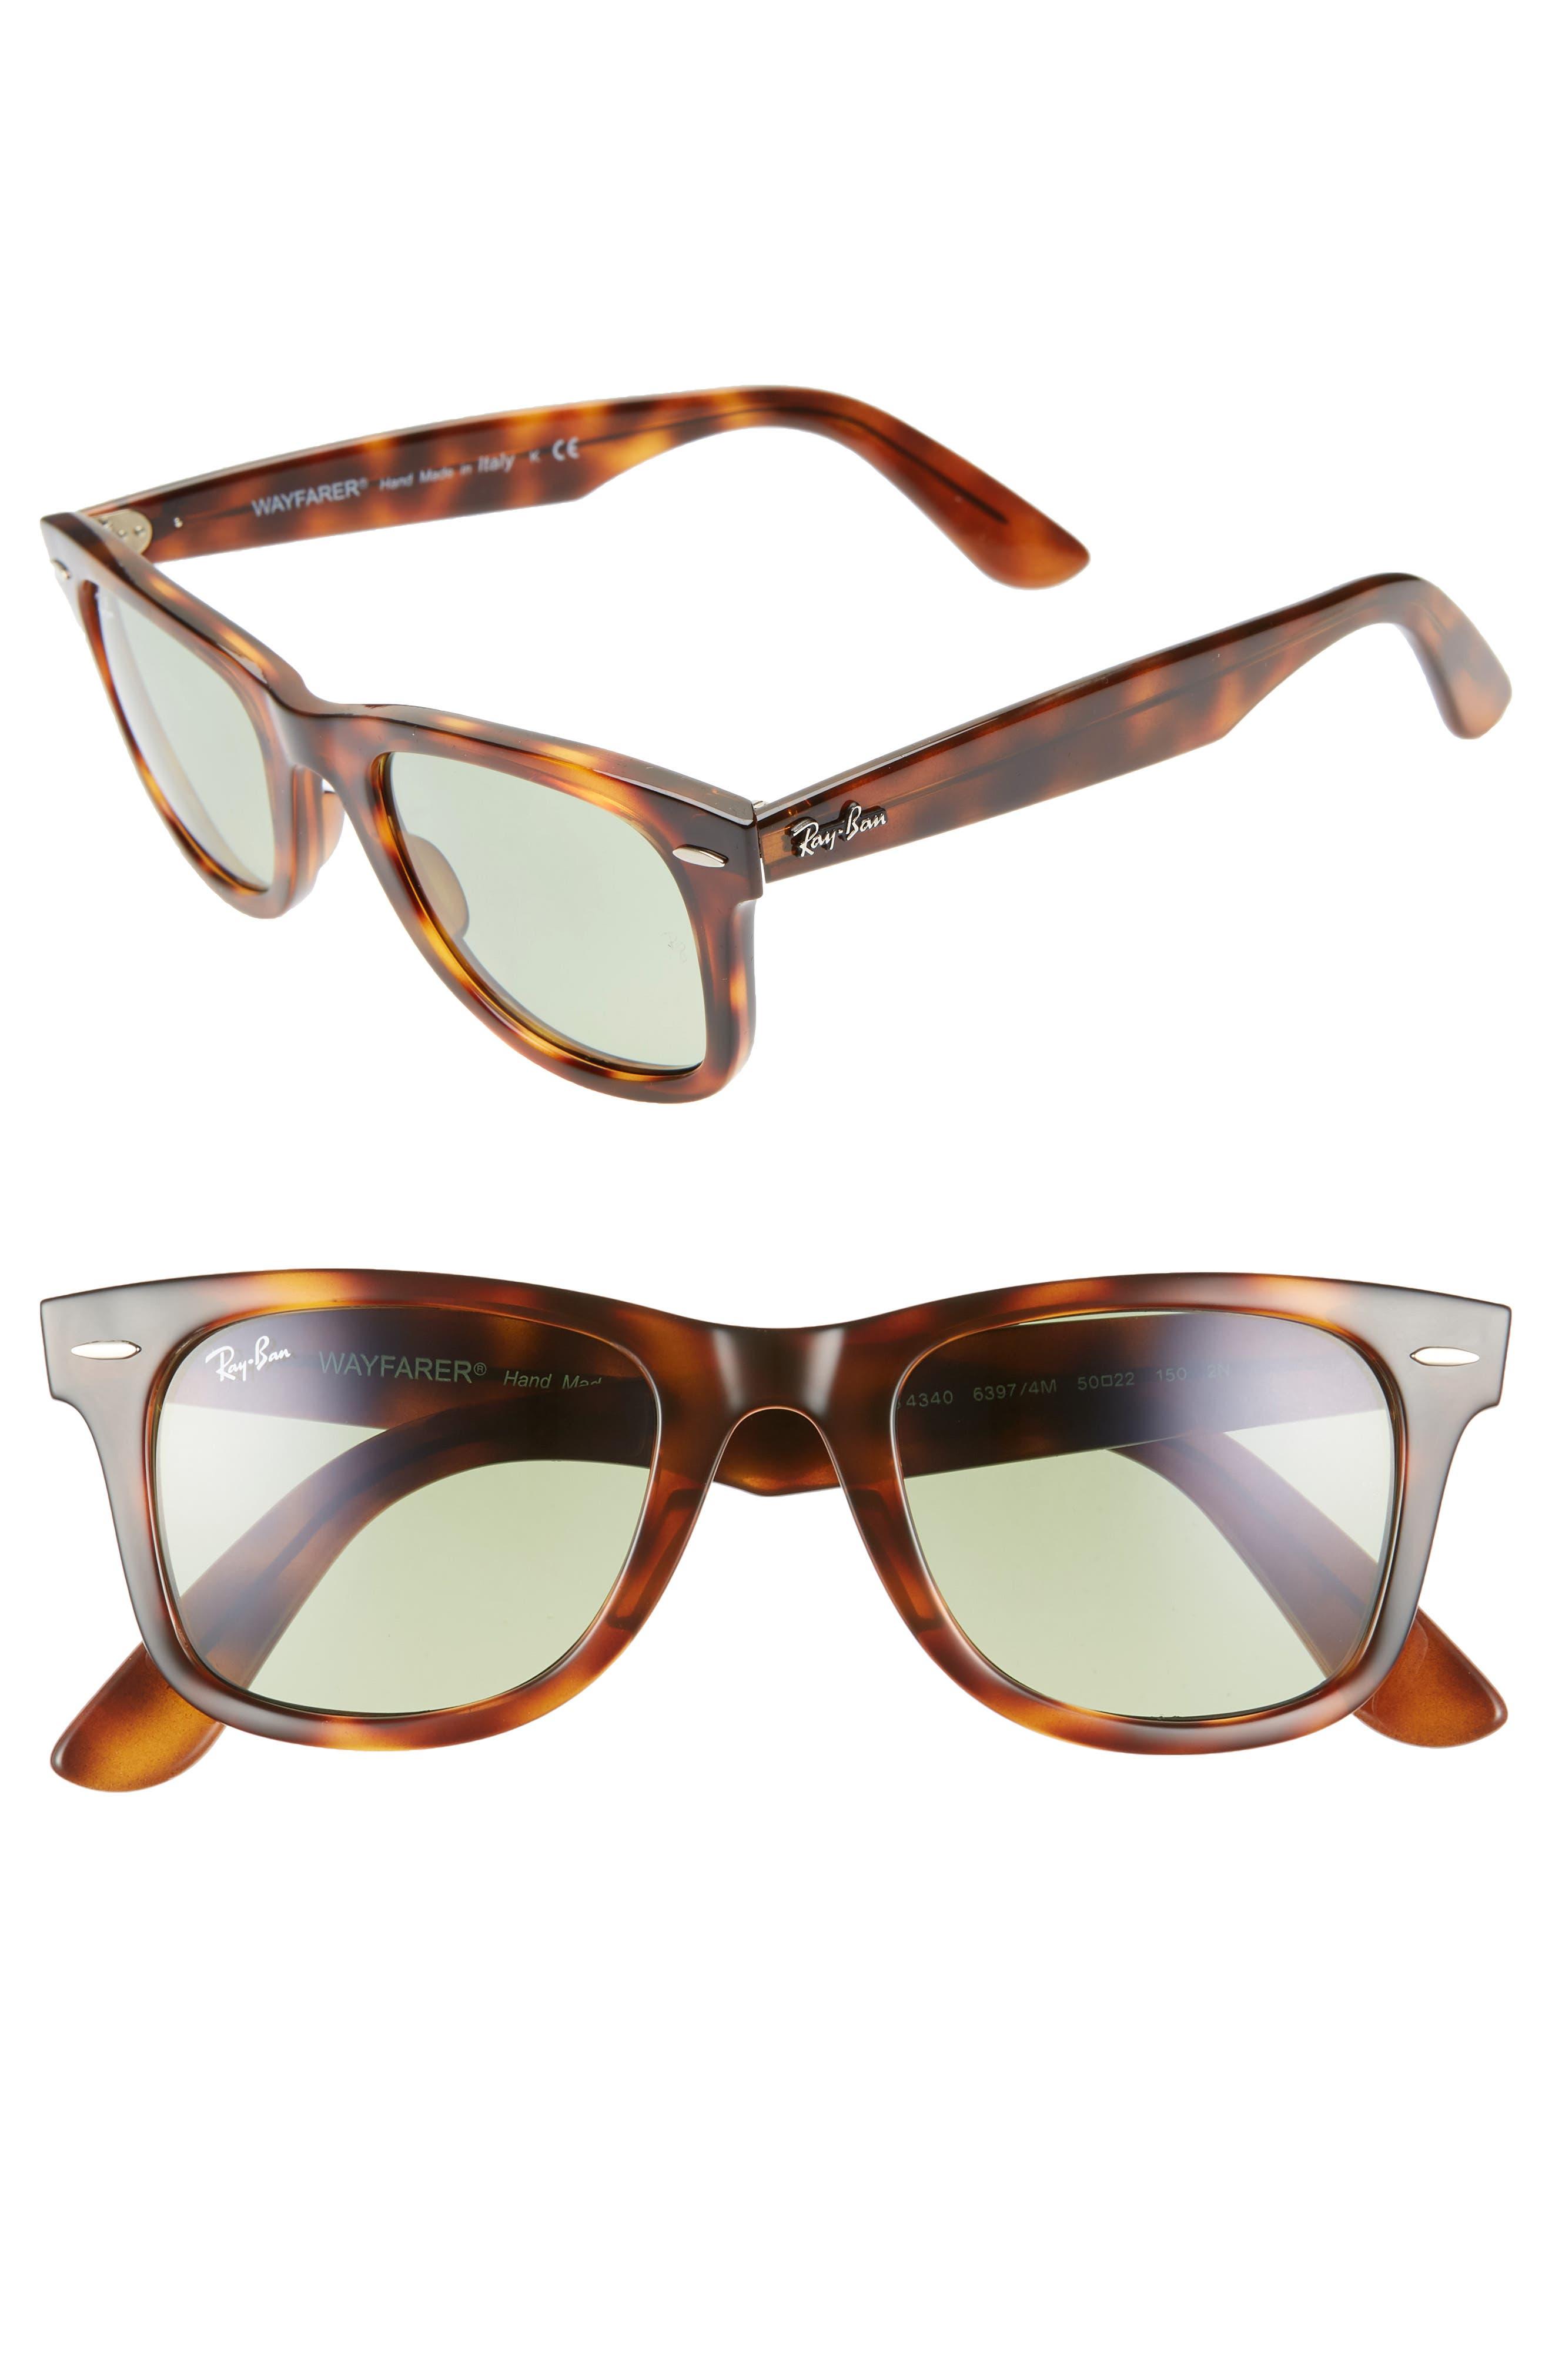 Ray-Ban Wayfarer 50Mm Gradient Sunglasses - Green